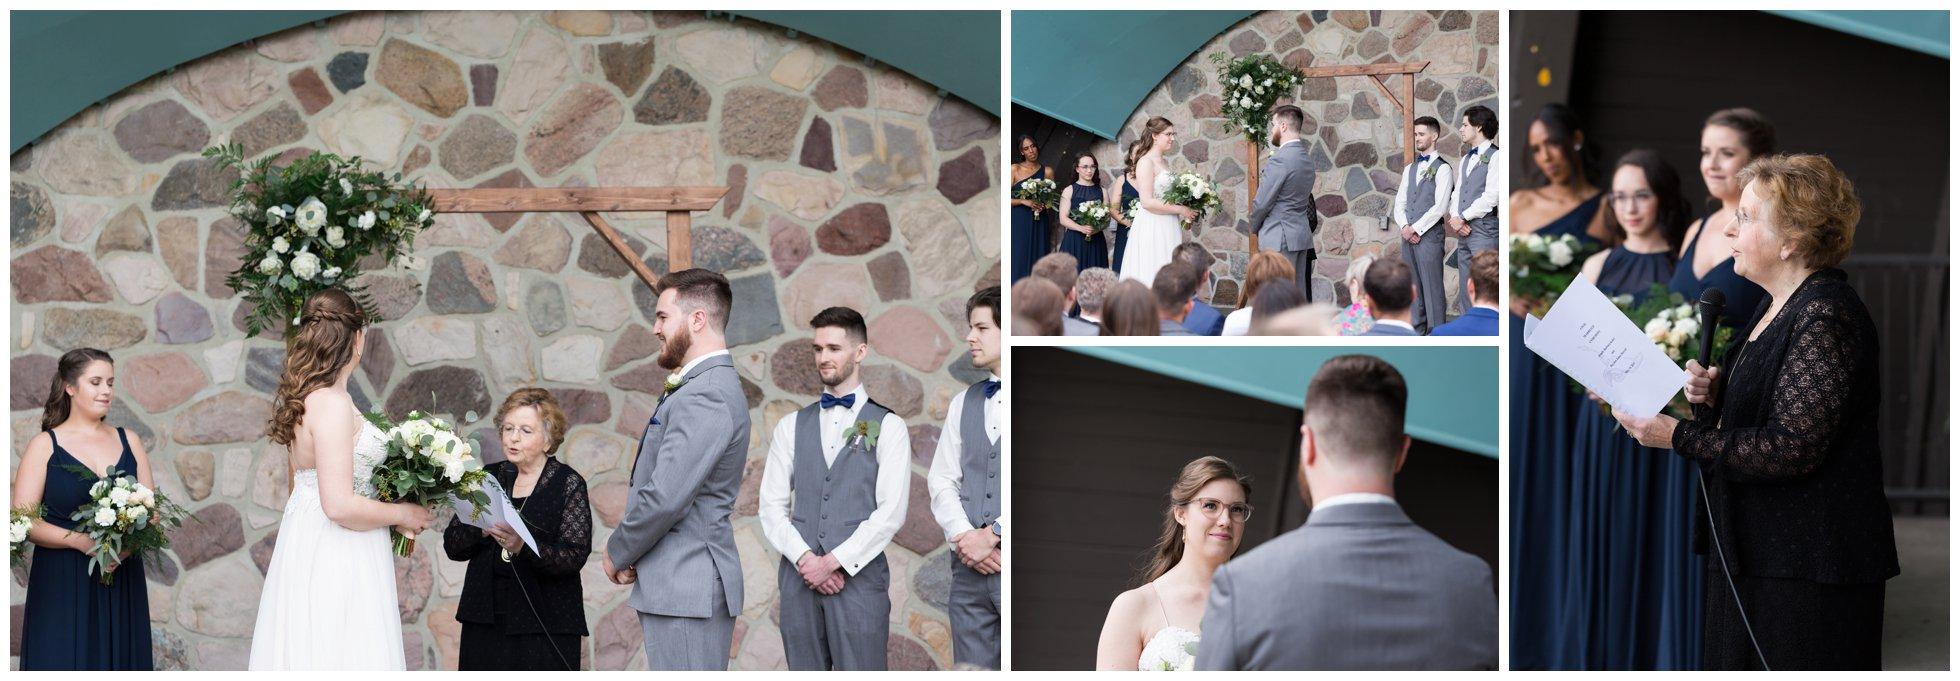 Emily and Royden Edmonton Wedding (Life by Selena Photography)_0004.jpg